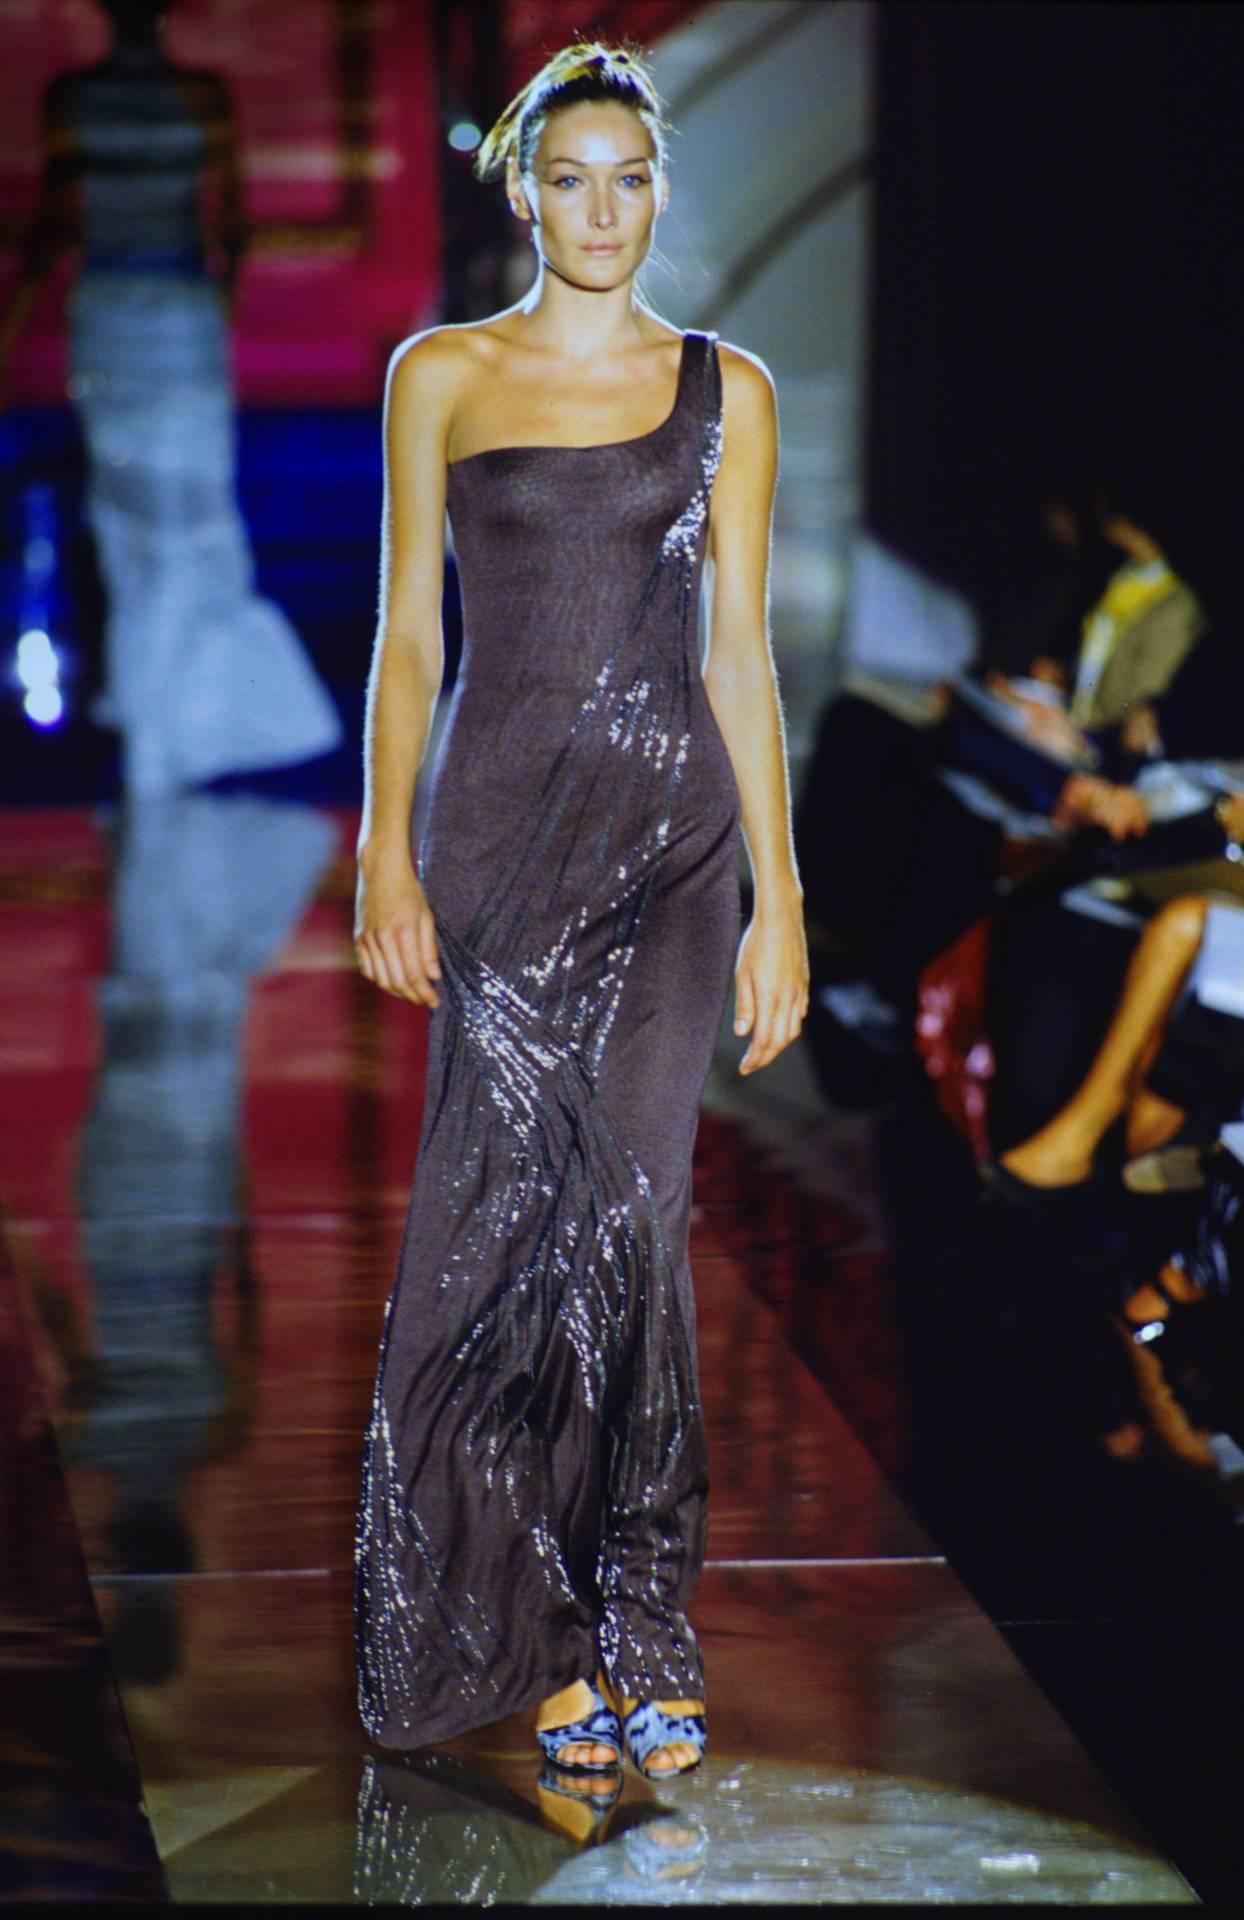 Atelier Versace Fall/Winter 1996Model: Carla Bruni #carla bruni#runway#90s#atelier versace#runwayvault